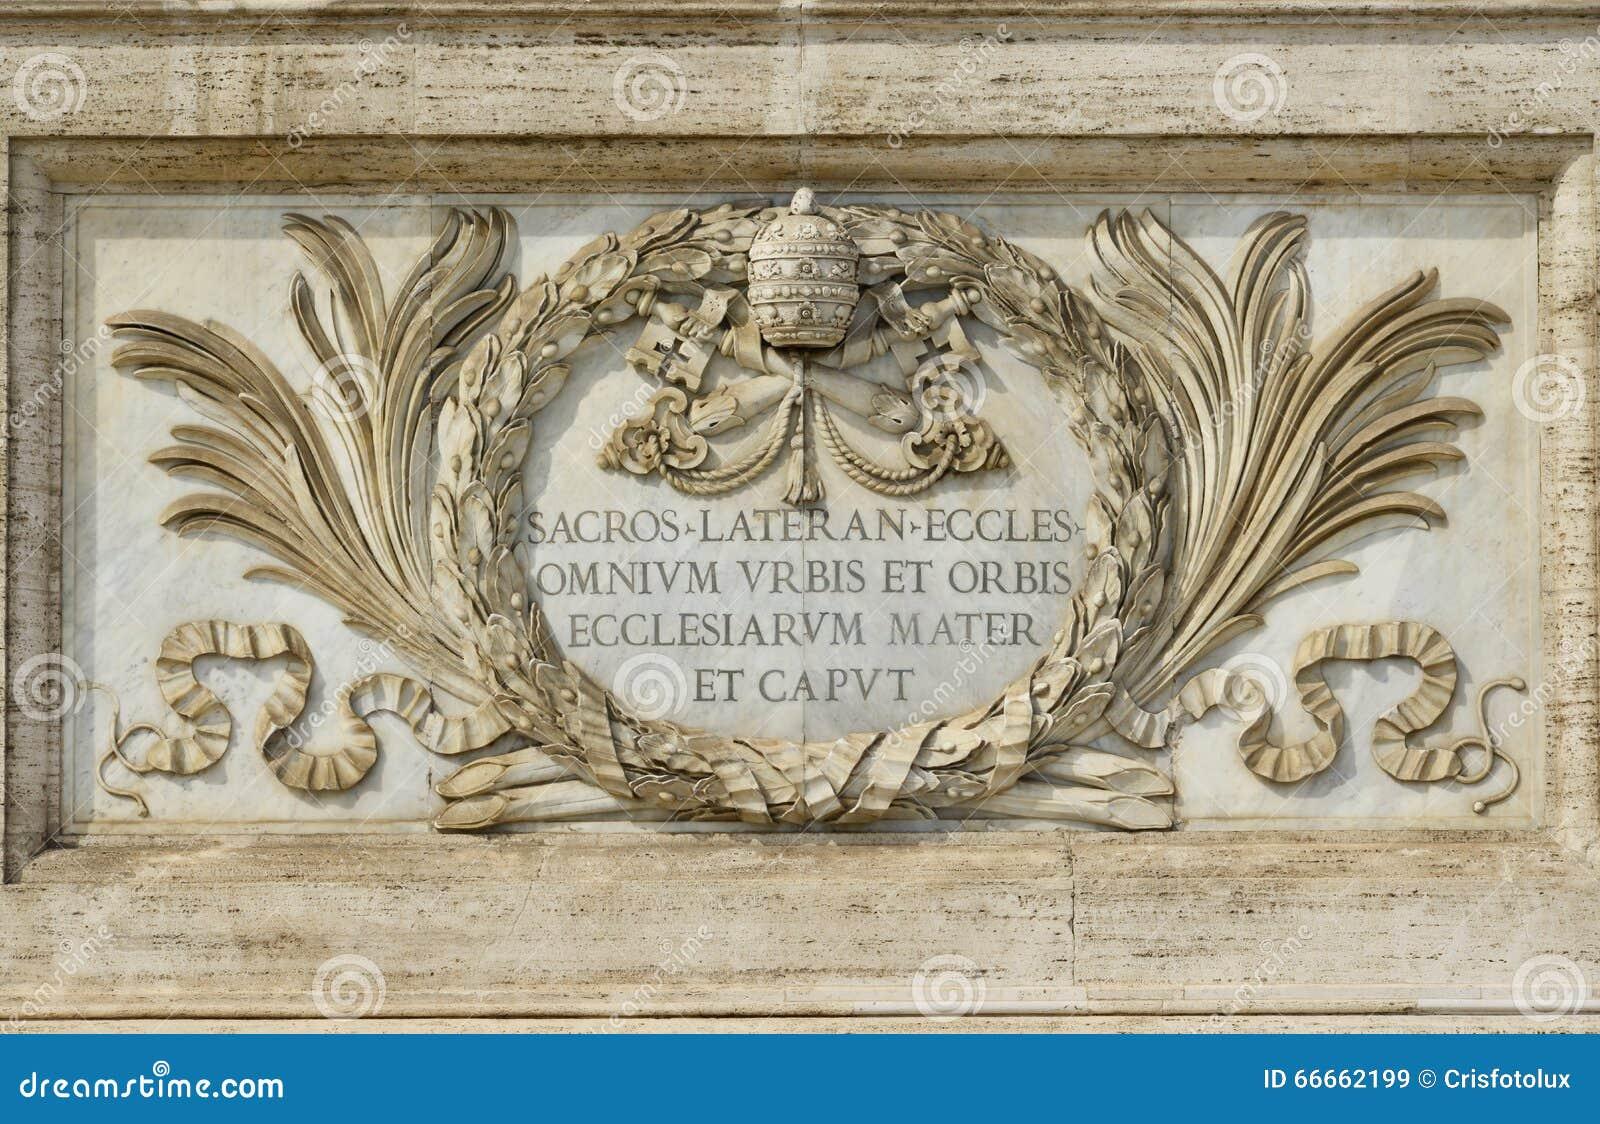 Lateran大教堂的圣约翰在罗马,最重要的churc